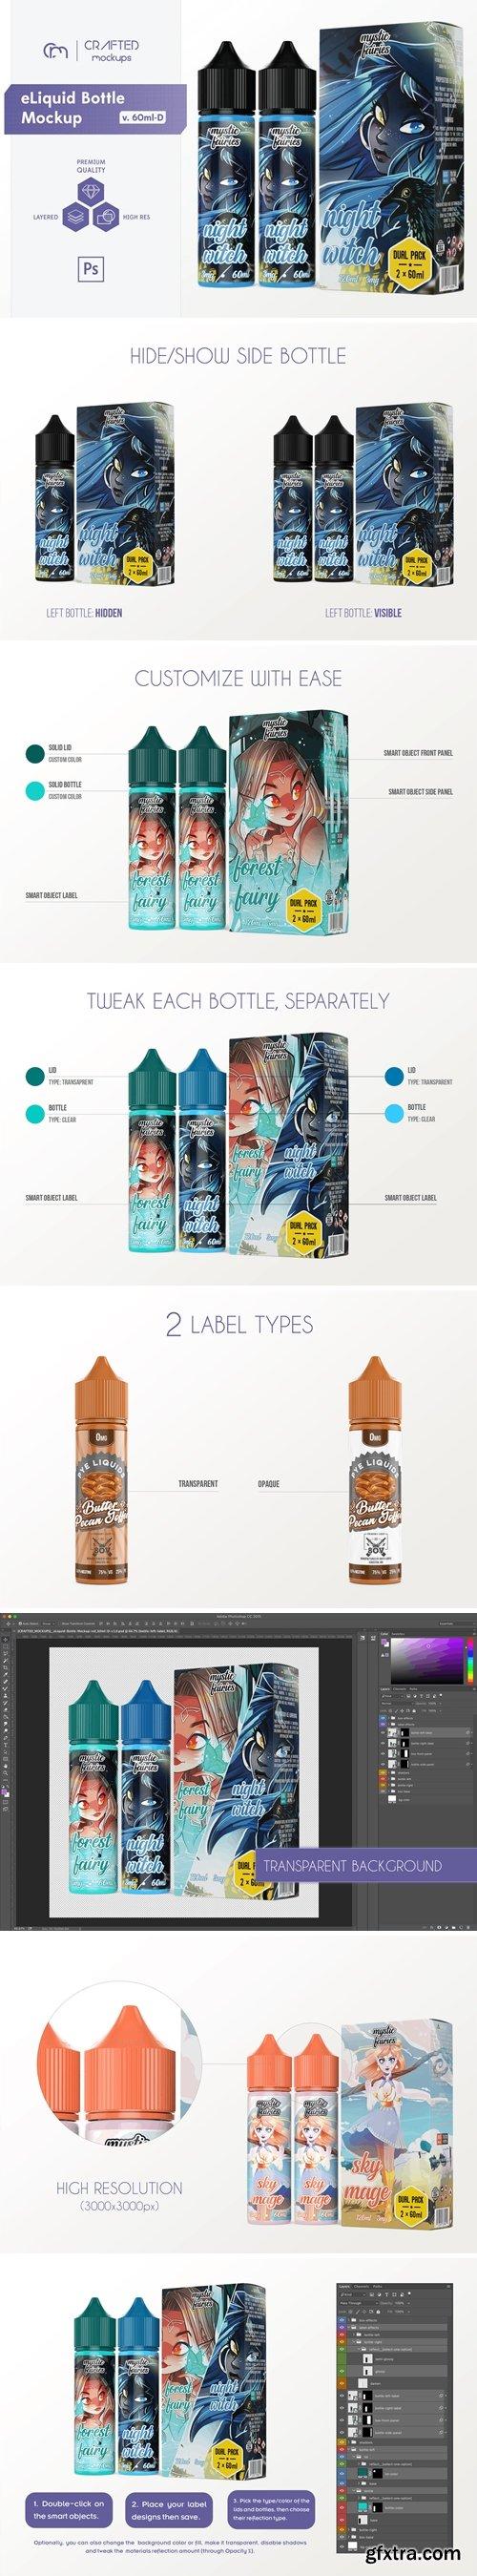 CreativeMarket - eLiquid Bottle Mockup v. 60ml-D 4081178